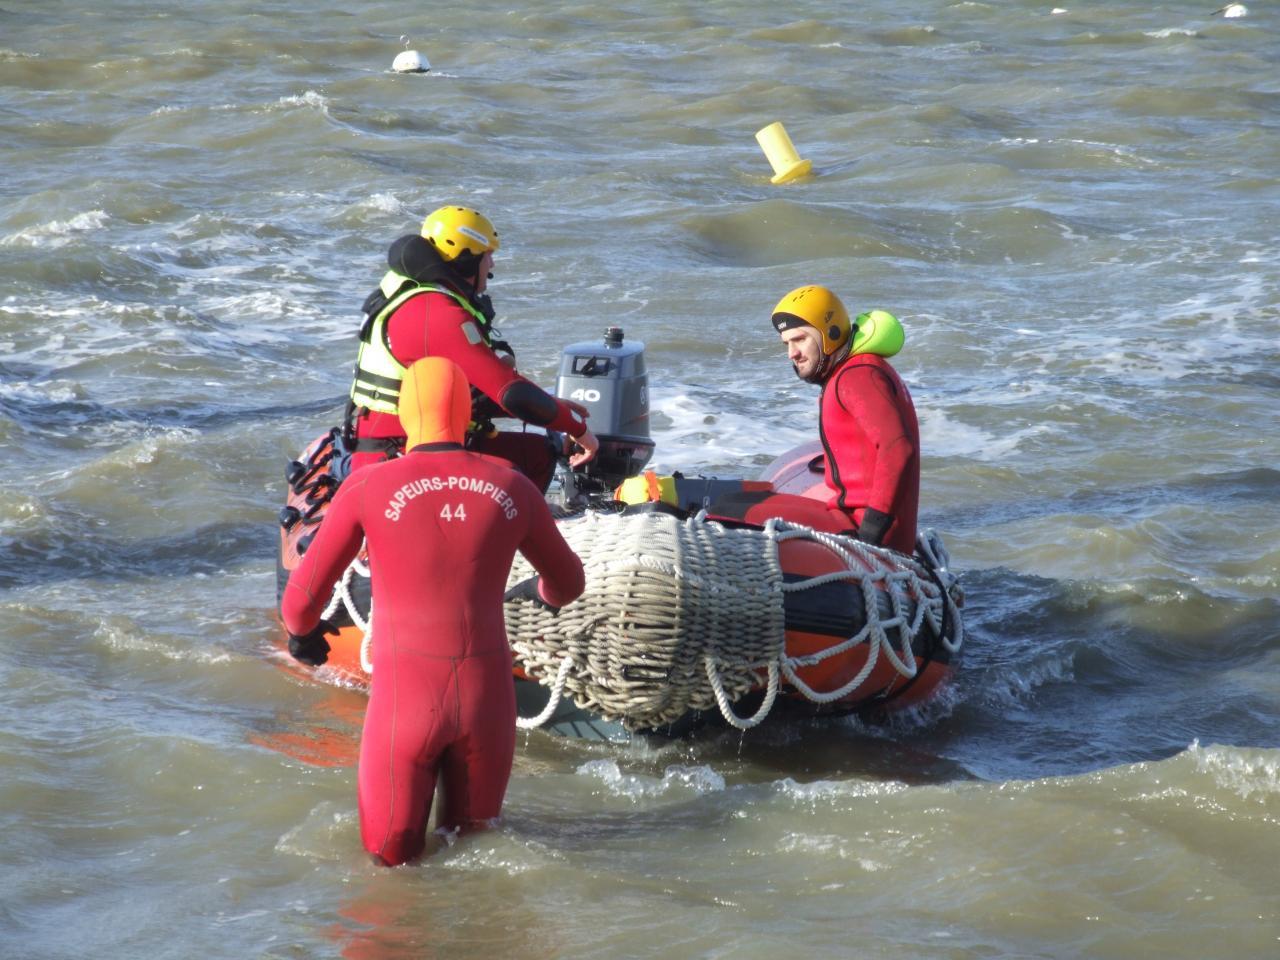 12 nov 2017 - Exercice de sauvetage